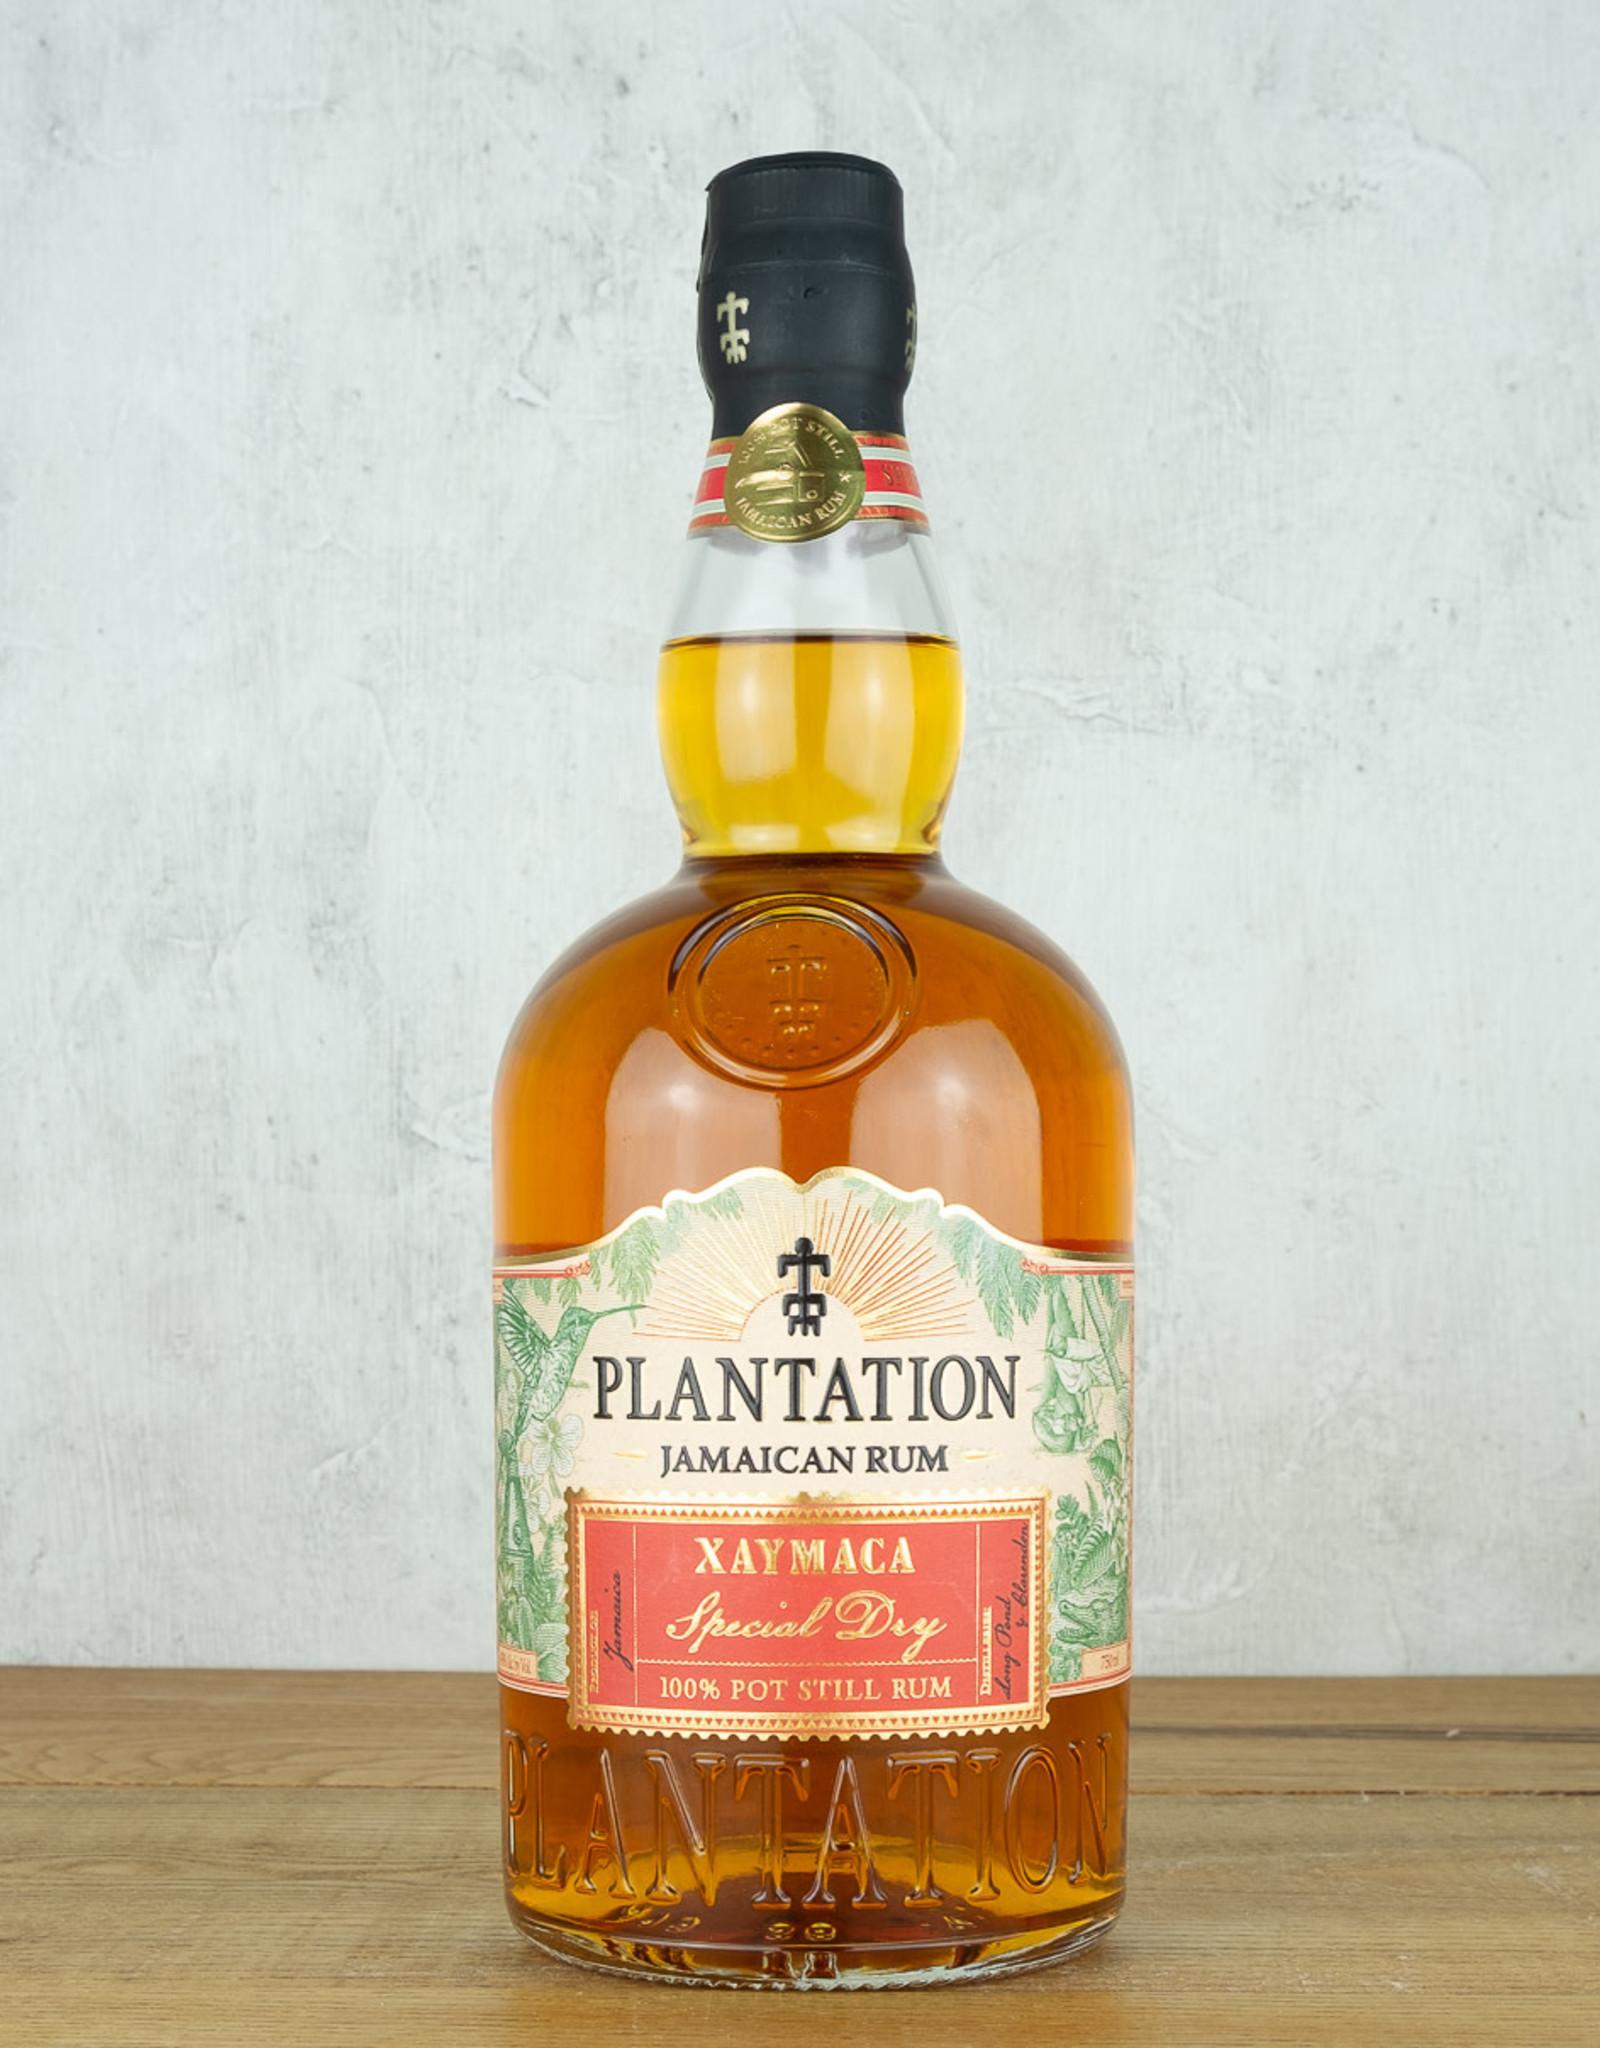 Plantation Rum Xaymaca Special Dry